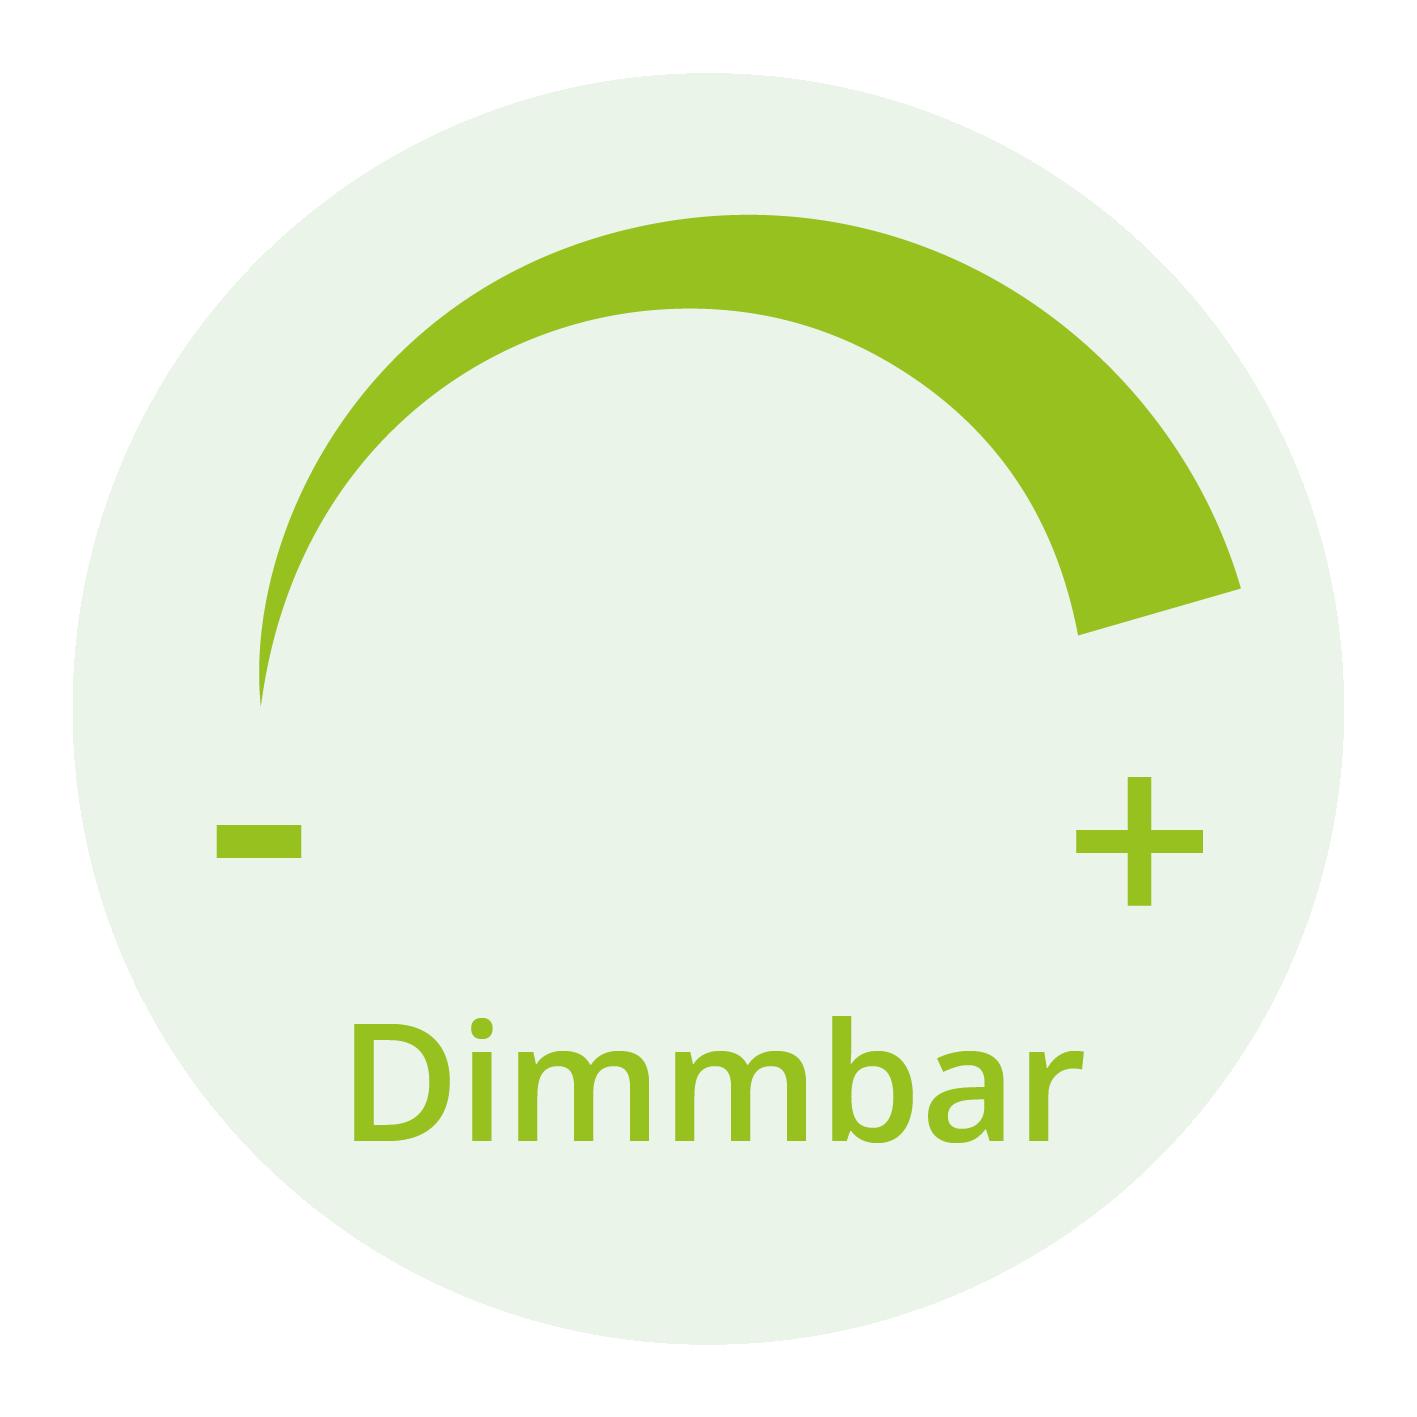 Noxion LED-Strahler PerfectColor GU10 4W 927 36D | Extra Warmweiß - Dimmbar - Ersatz für 35W | Dimmbar